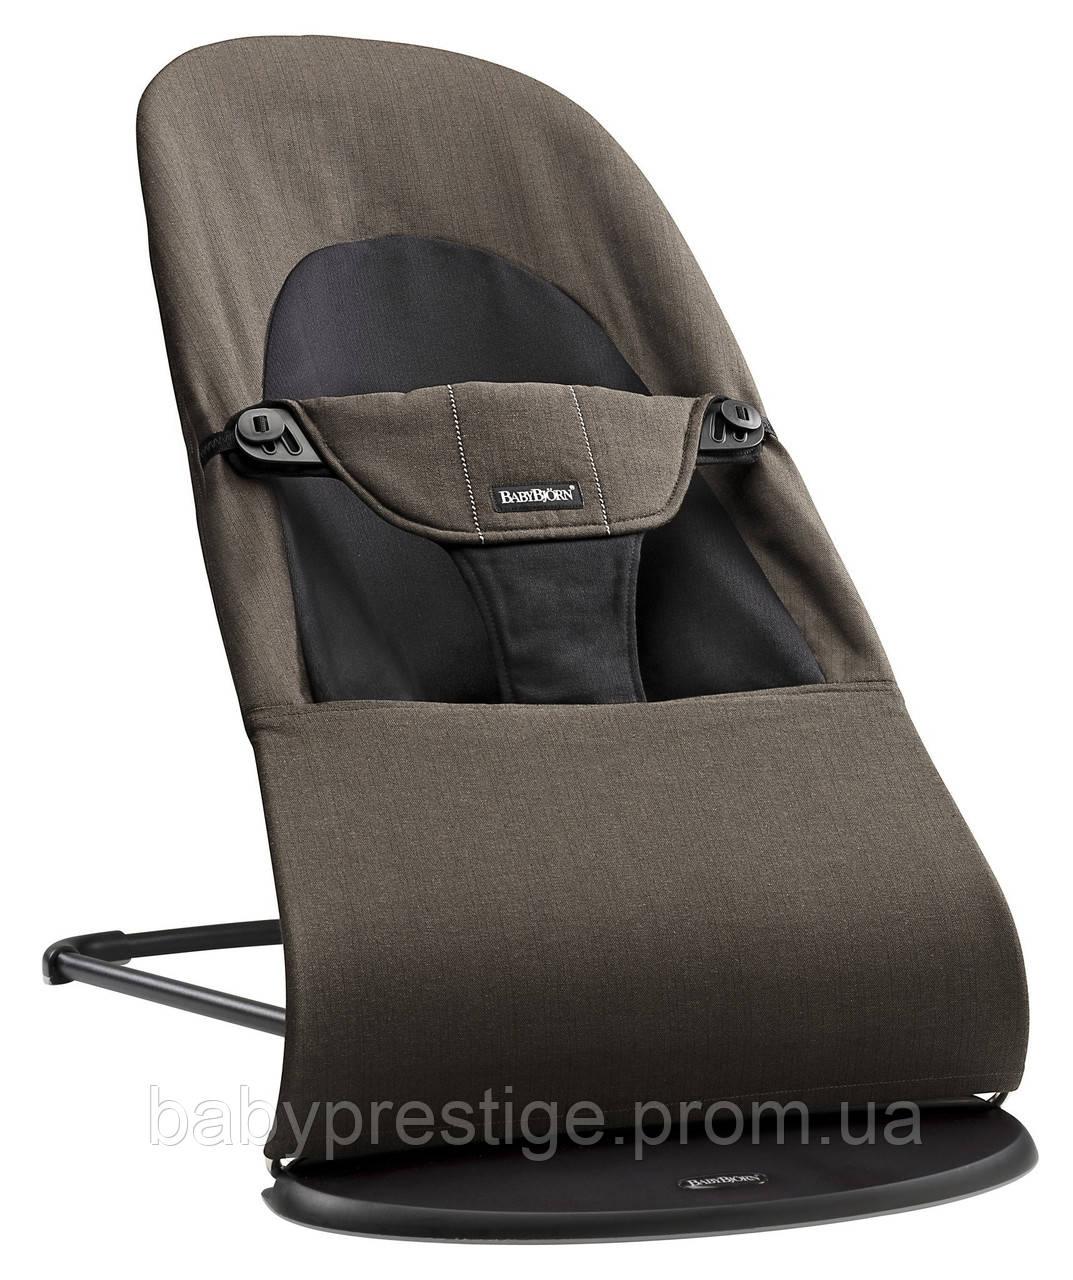 Кресло-шезлонг  от BABYBJORN - Balance Soft ORGANIC-Black / Brown